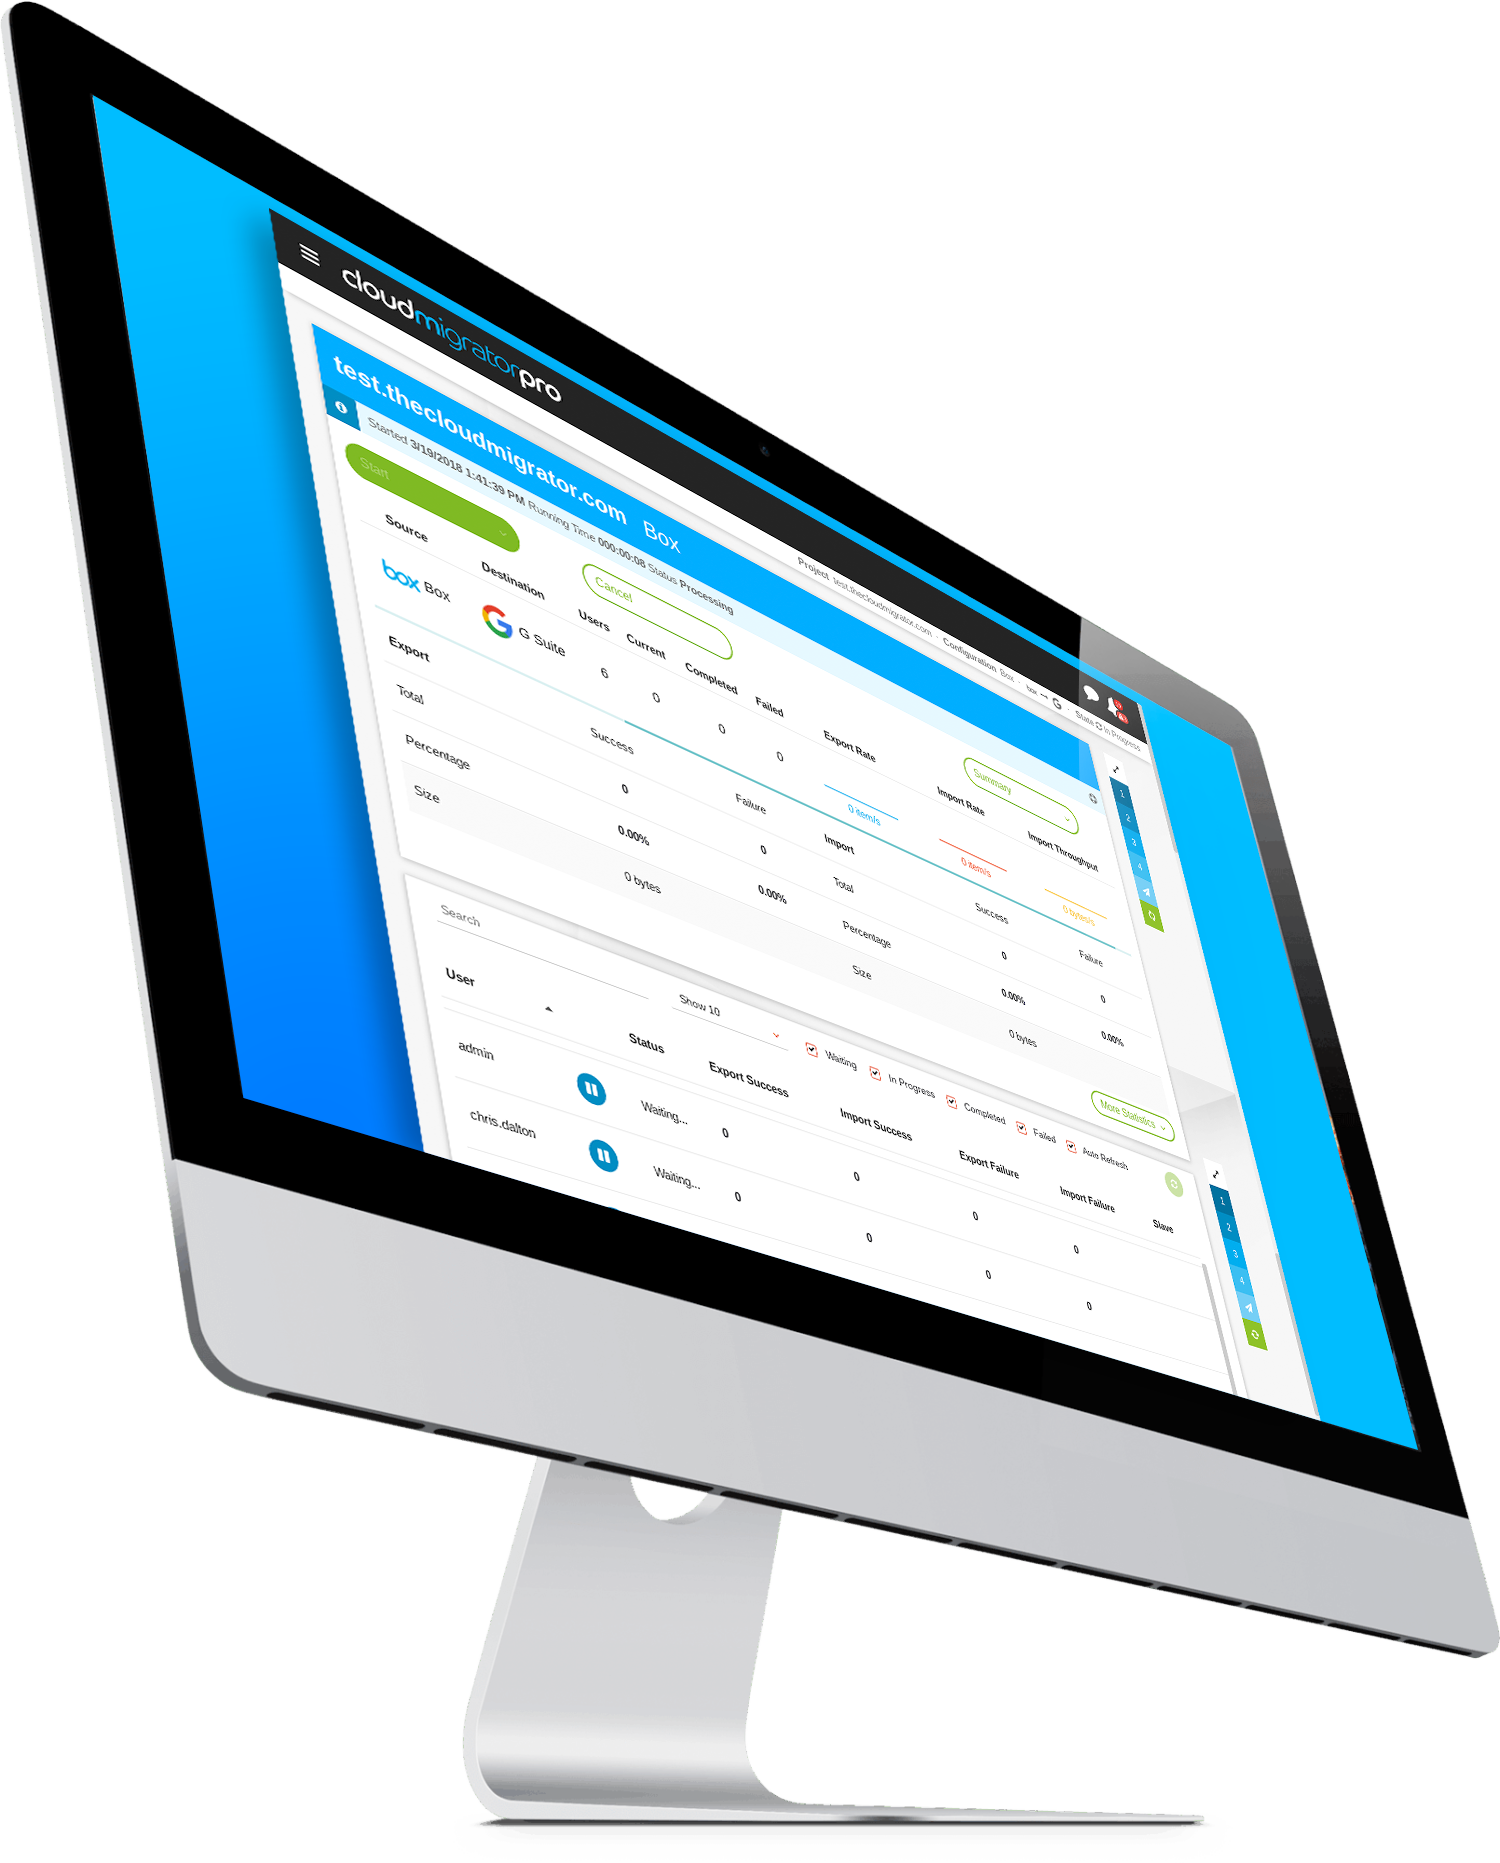 Cloudmigratorpro Mac Screen